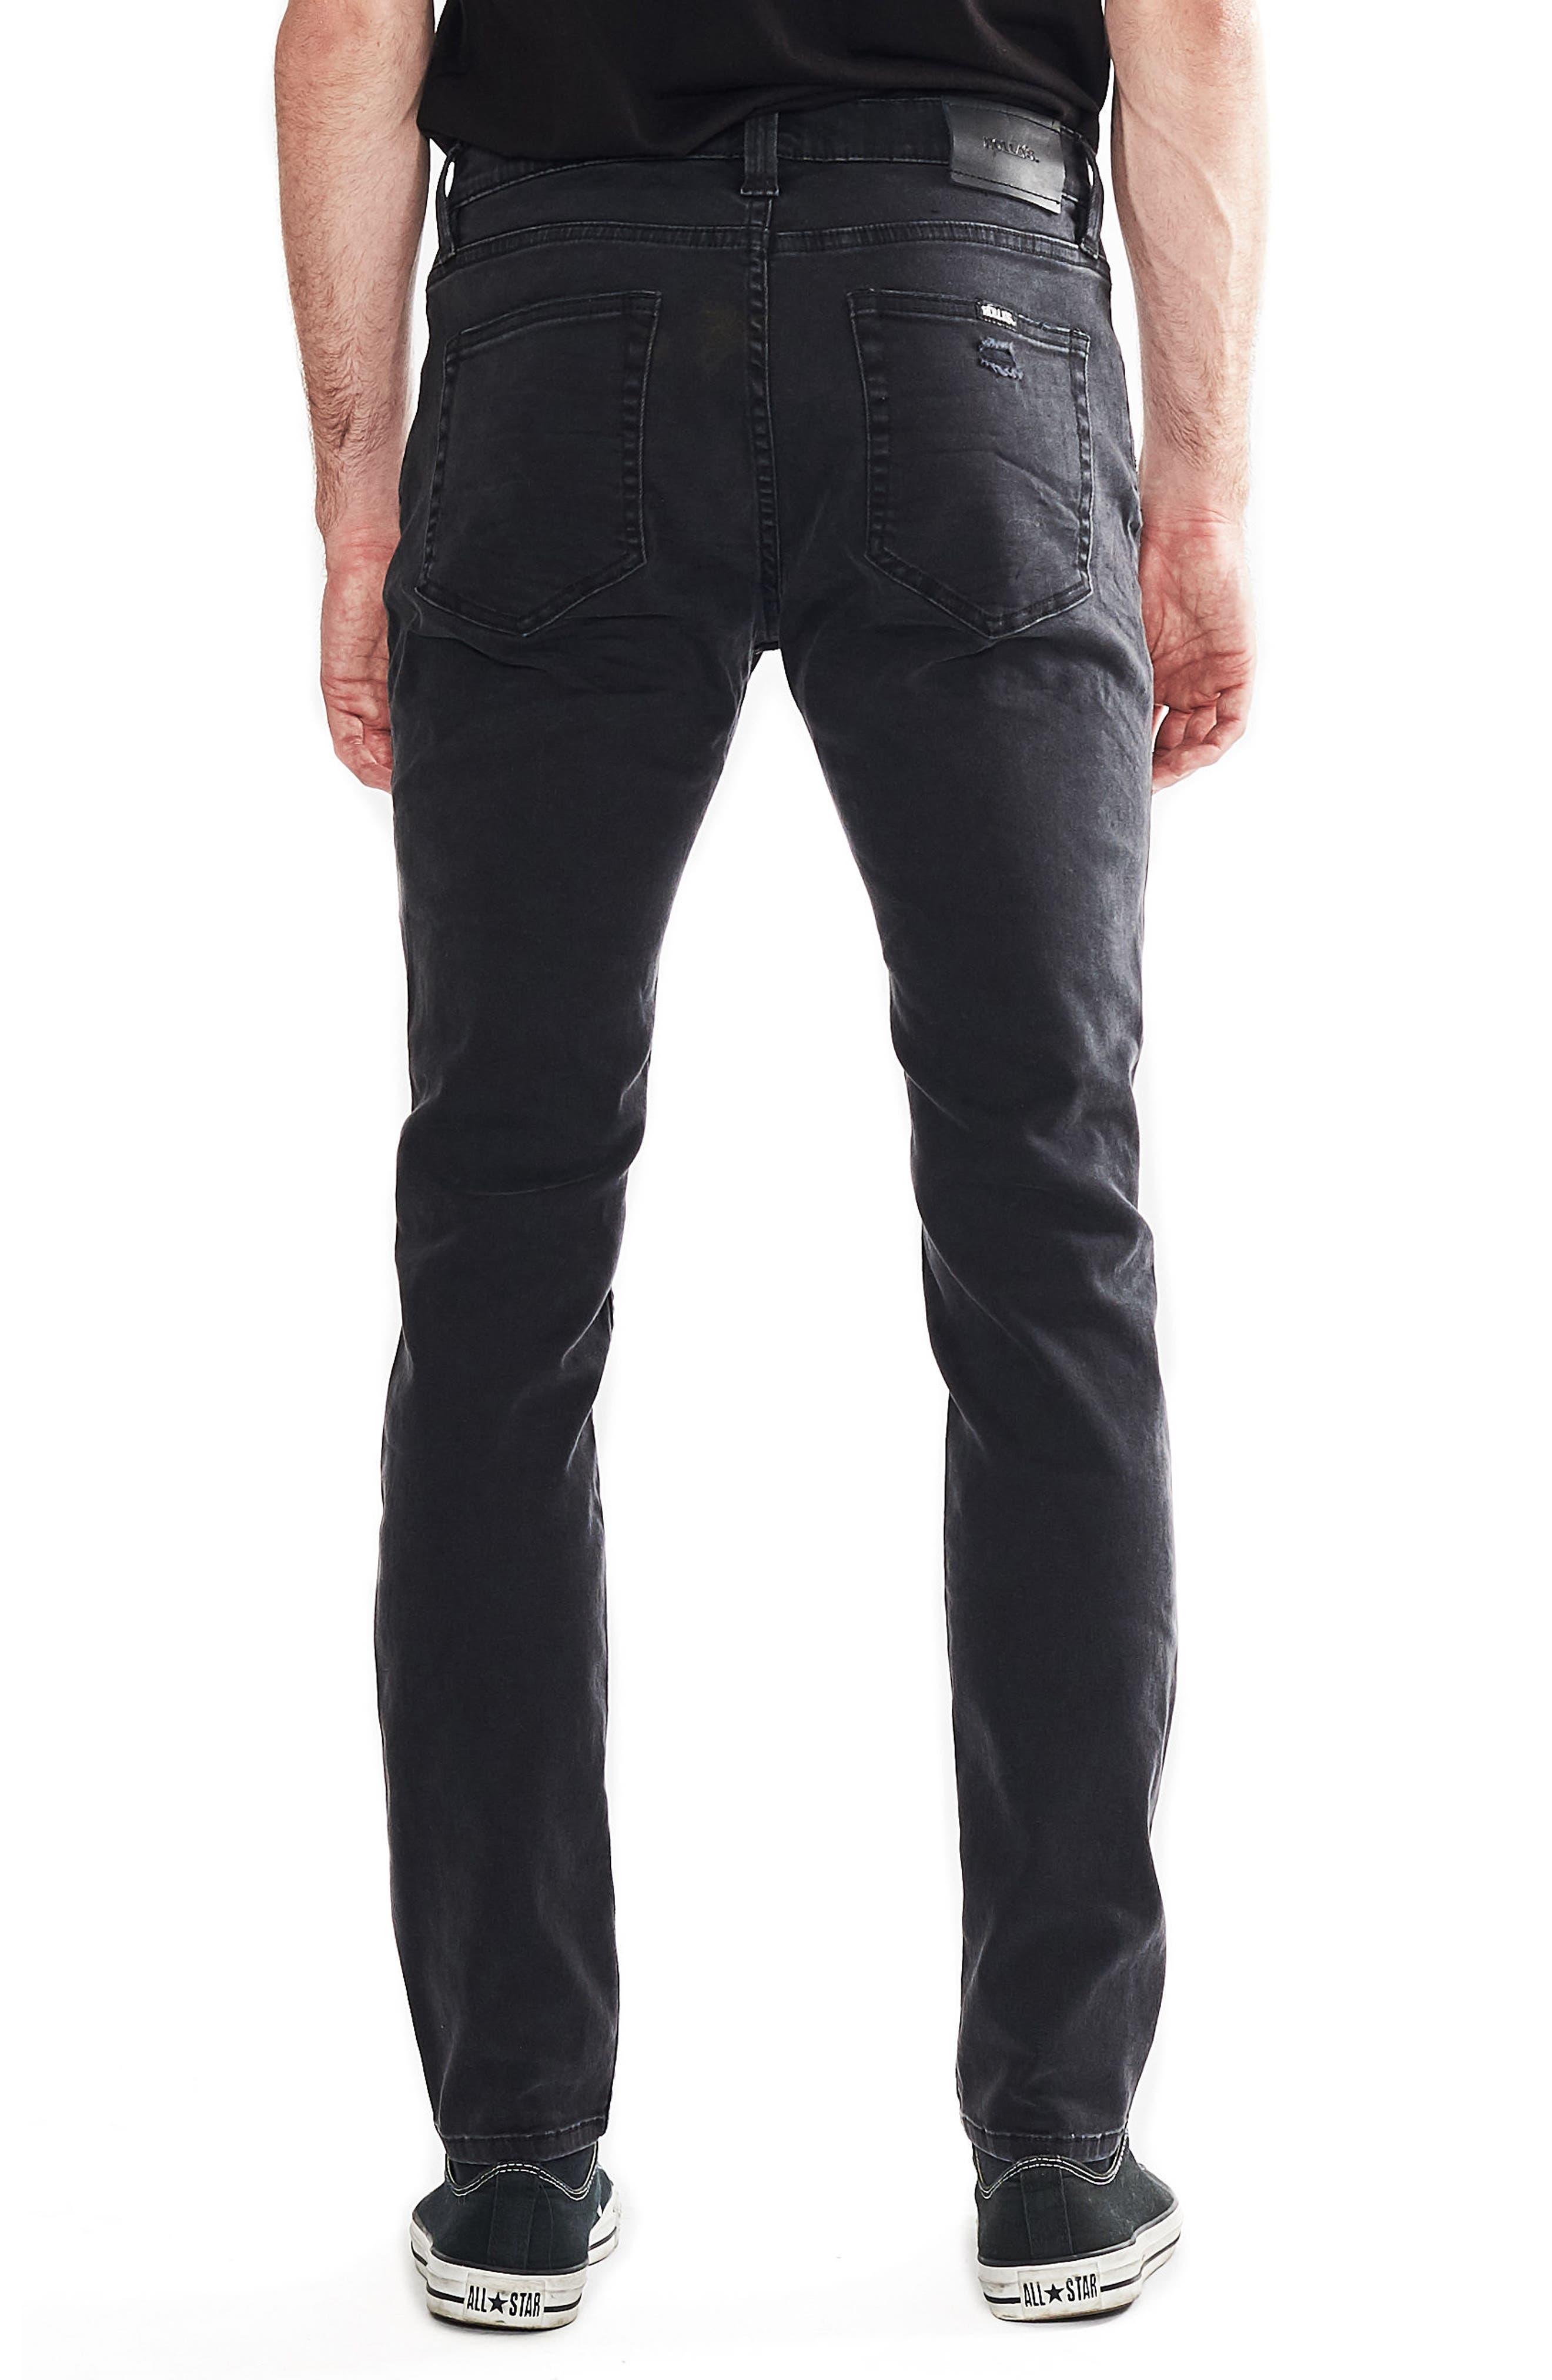 Stinger Skinny Fit Jeans,                             Alternate thumbnail 2, color,                             BLOWOUT BLACK